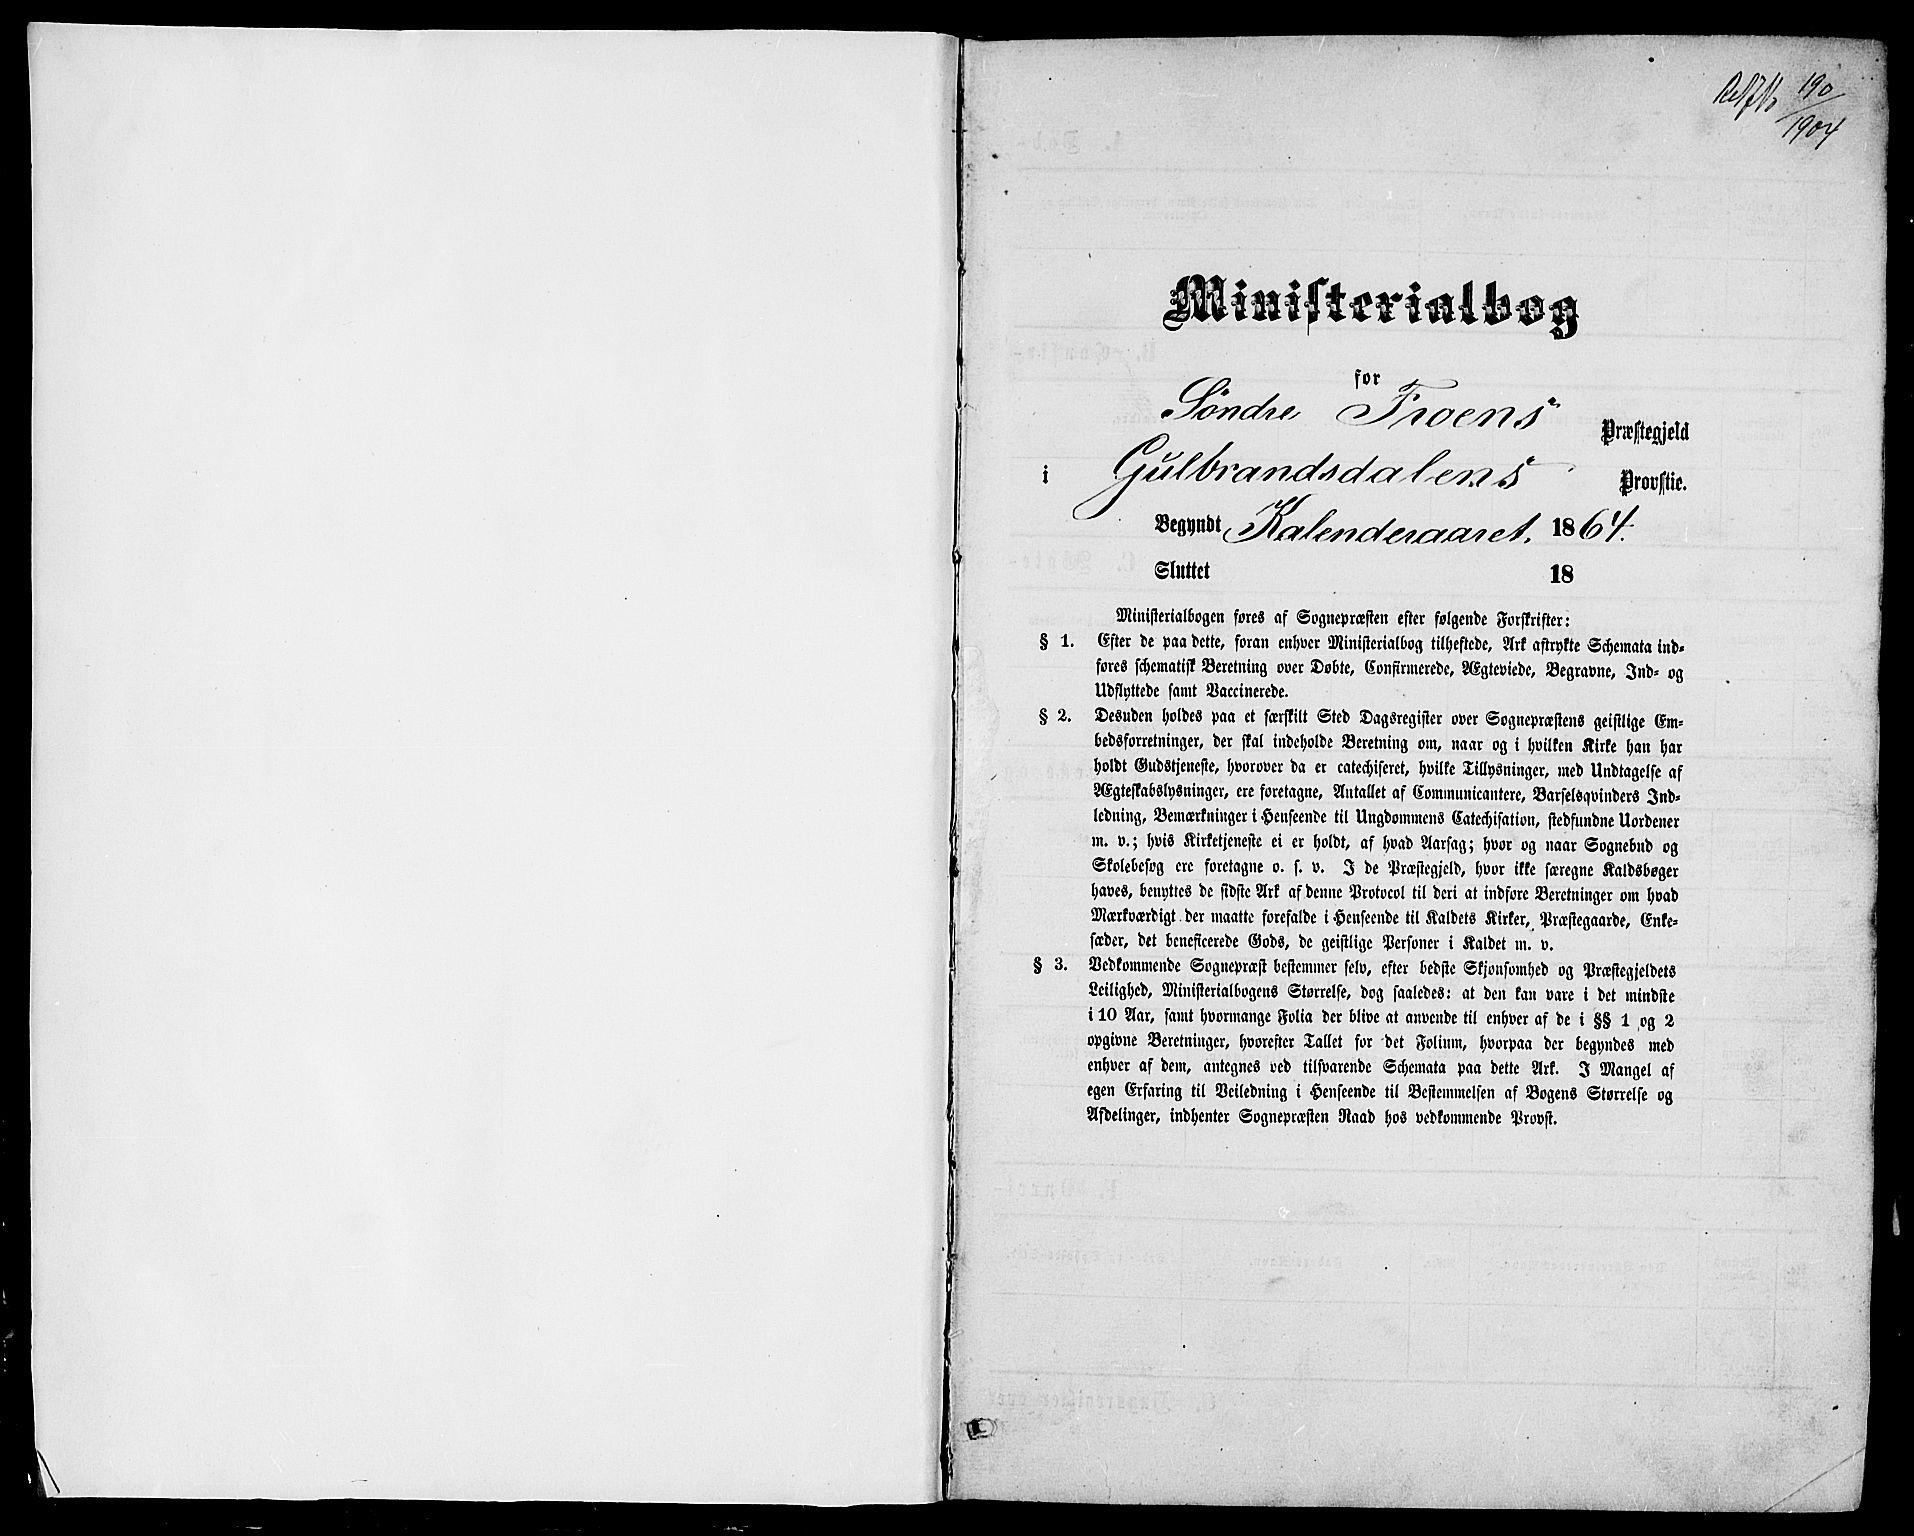 SAH, Sør-Fron prestekontor, H/Ha/Hab/L0002: Klokkerbok nr. 2, 1864-1883